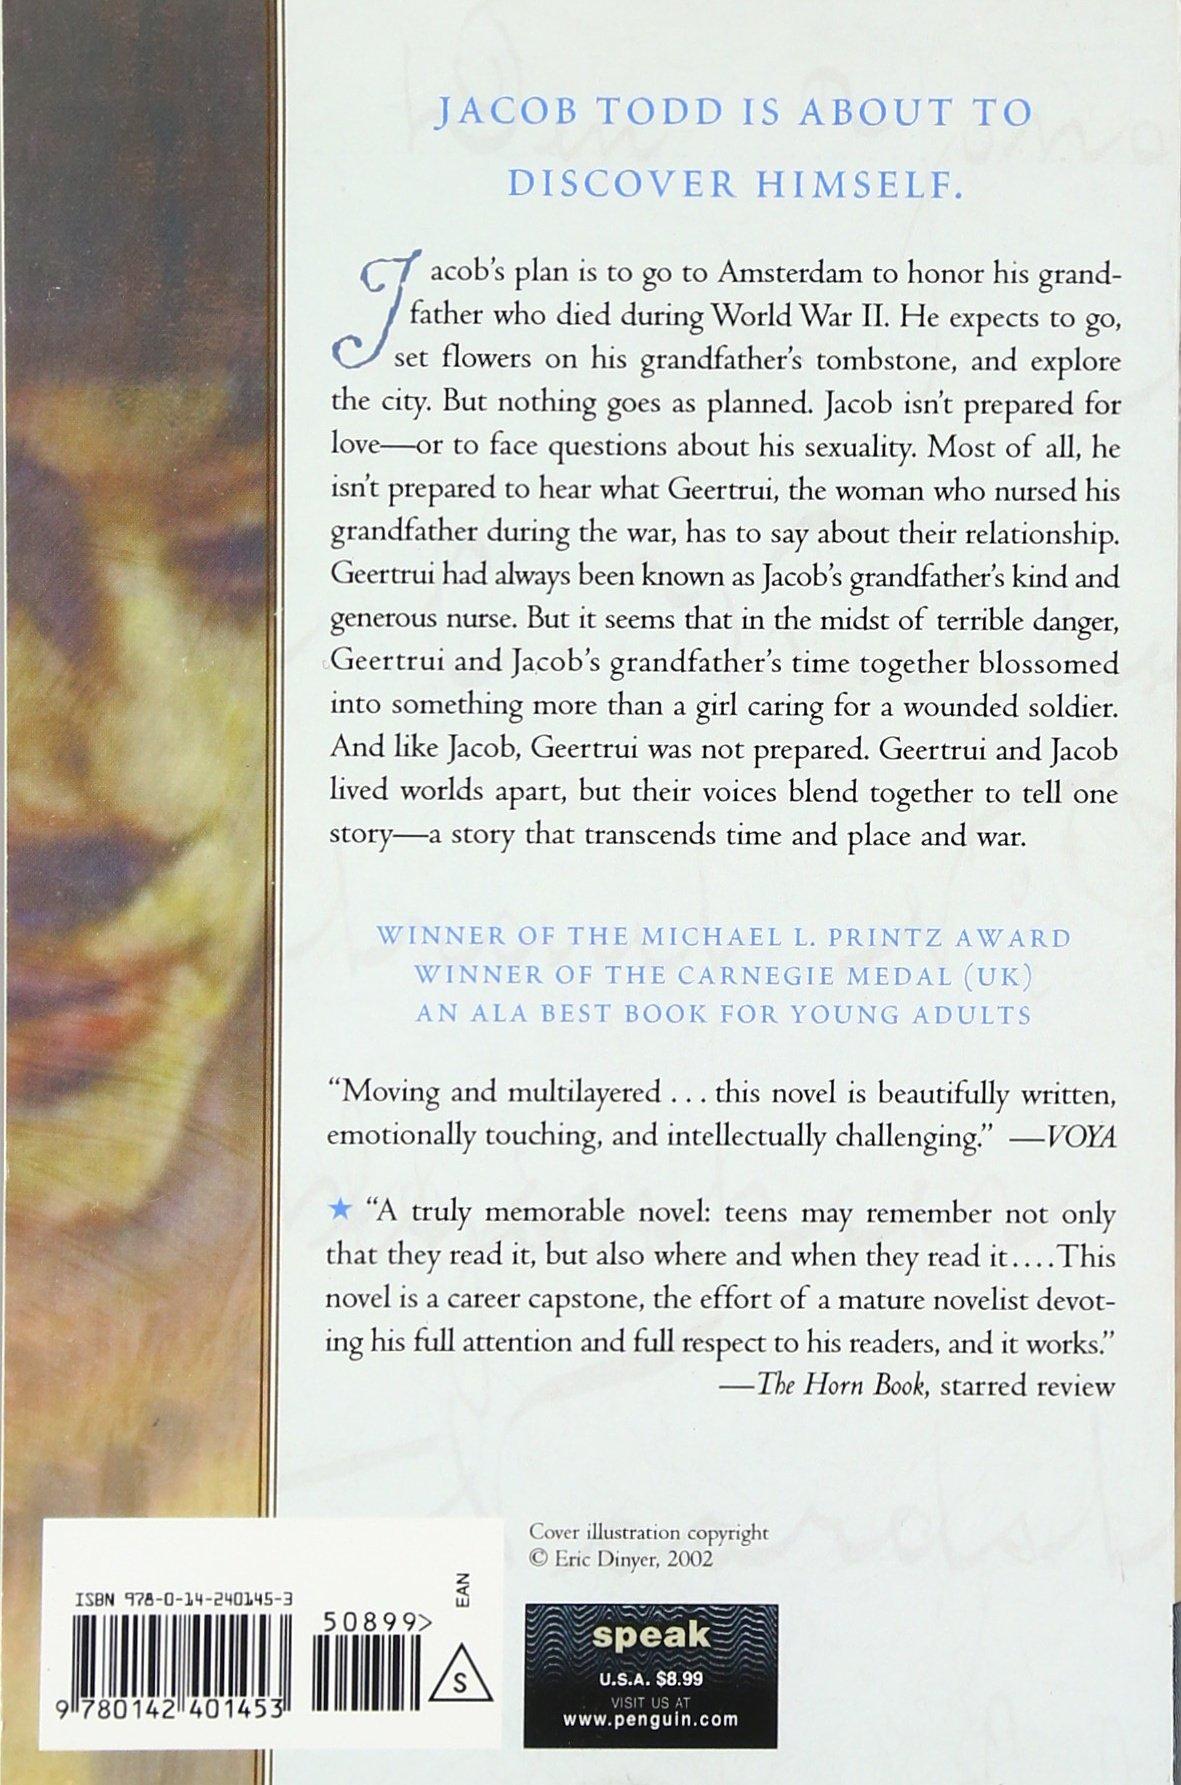 Amazon: Postcards From No Man's Land (9780142401453): Aidan Chambers:  Books